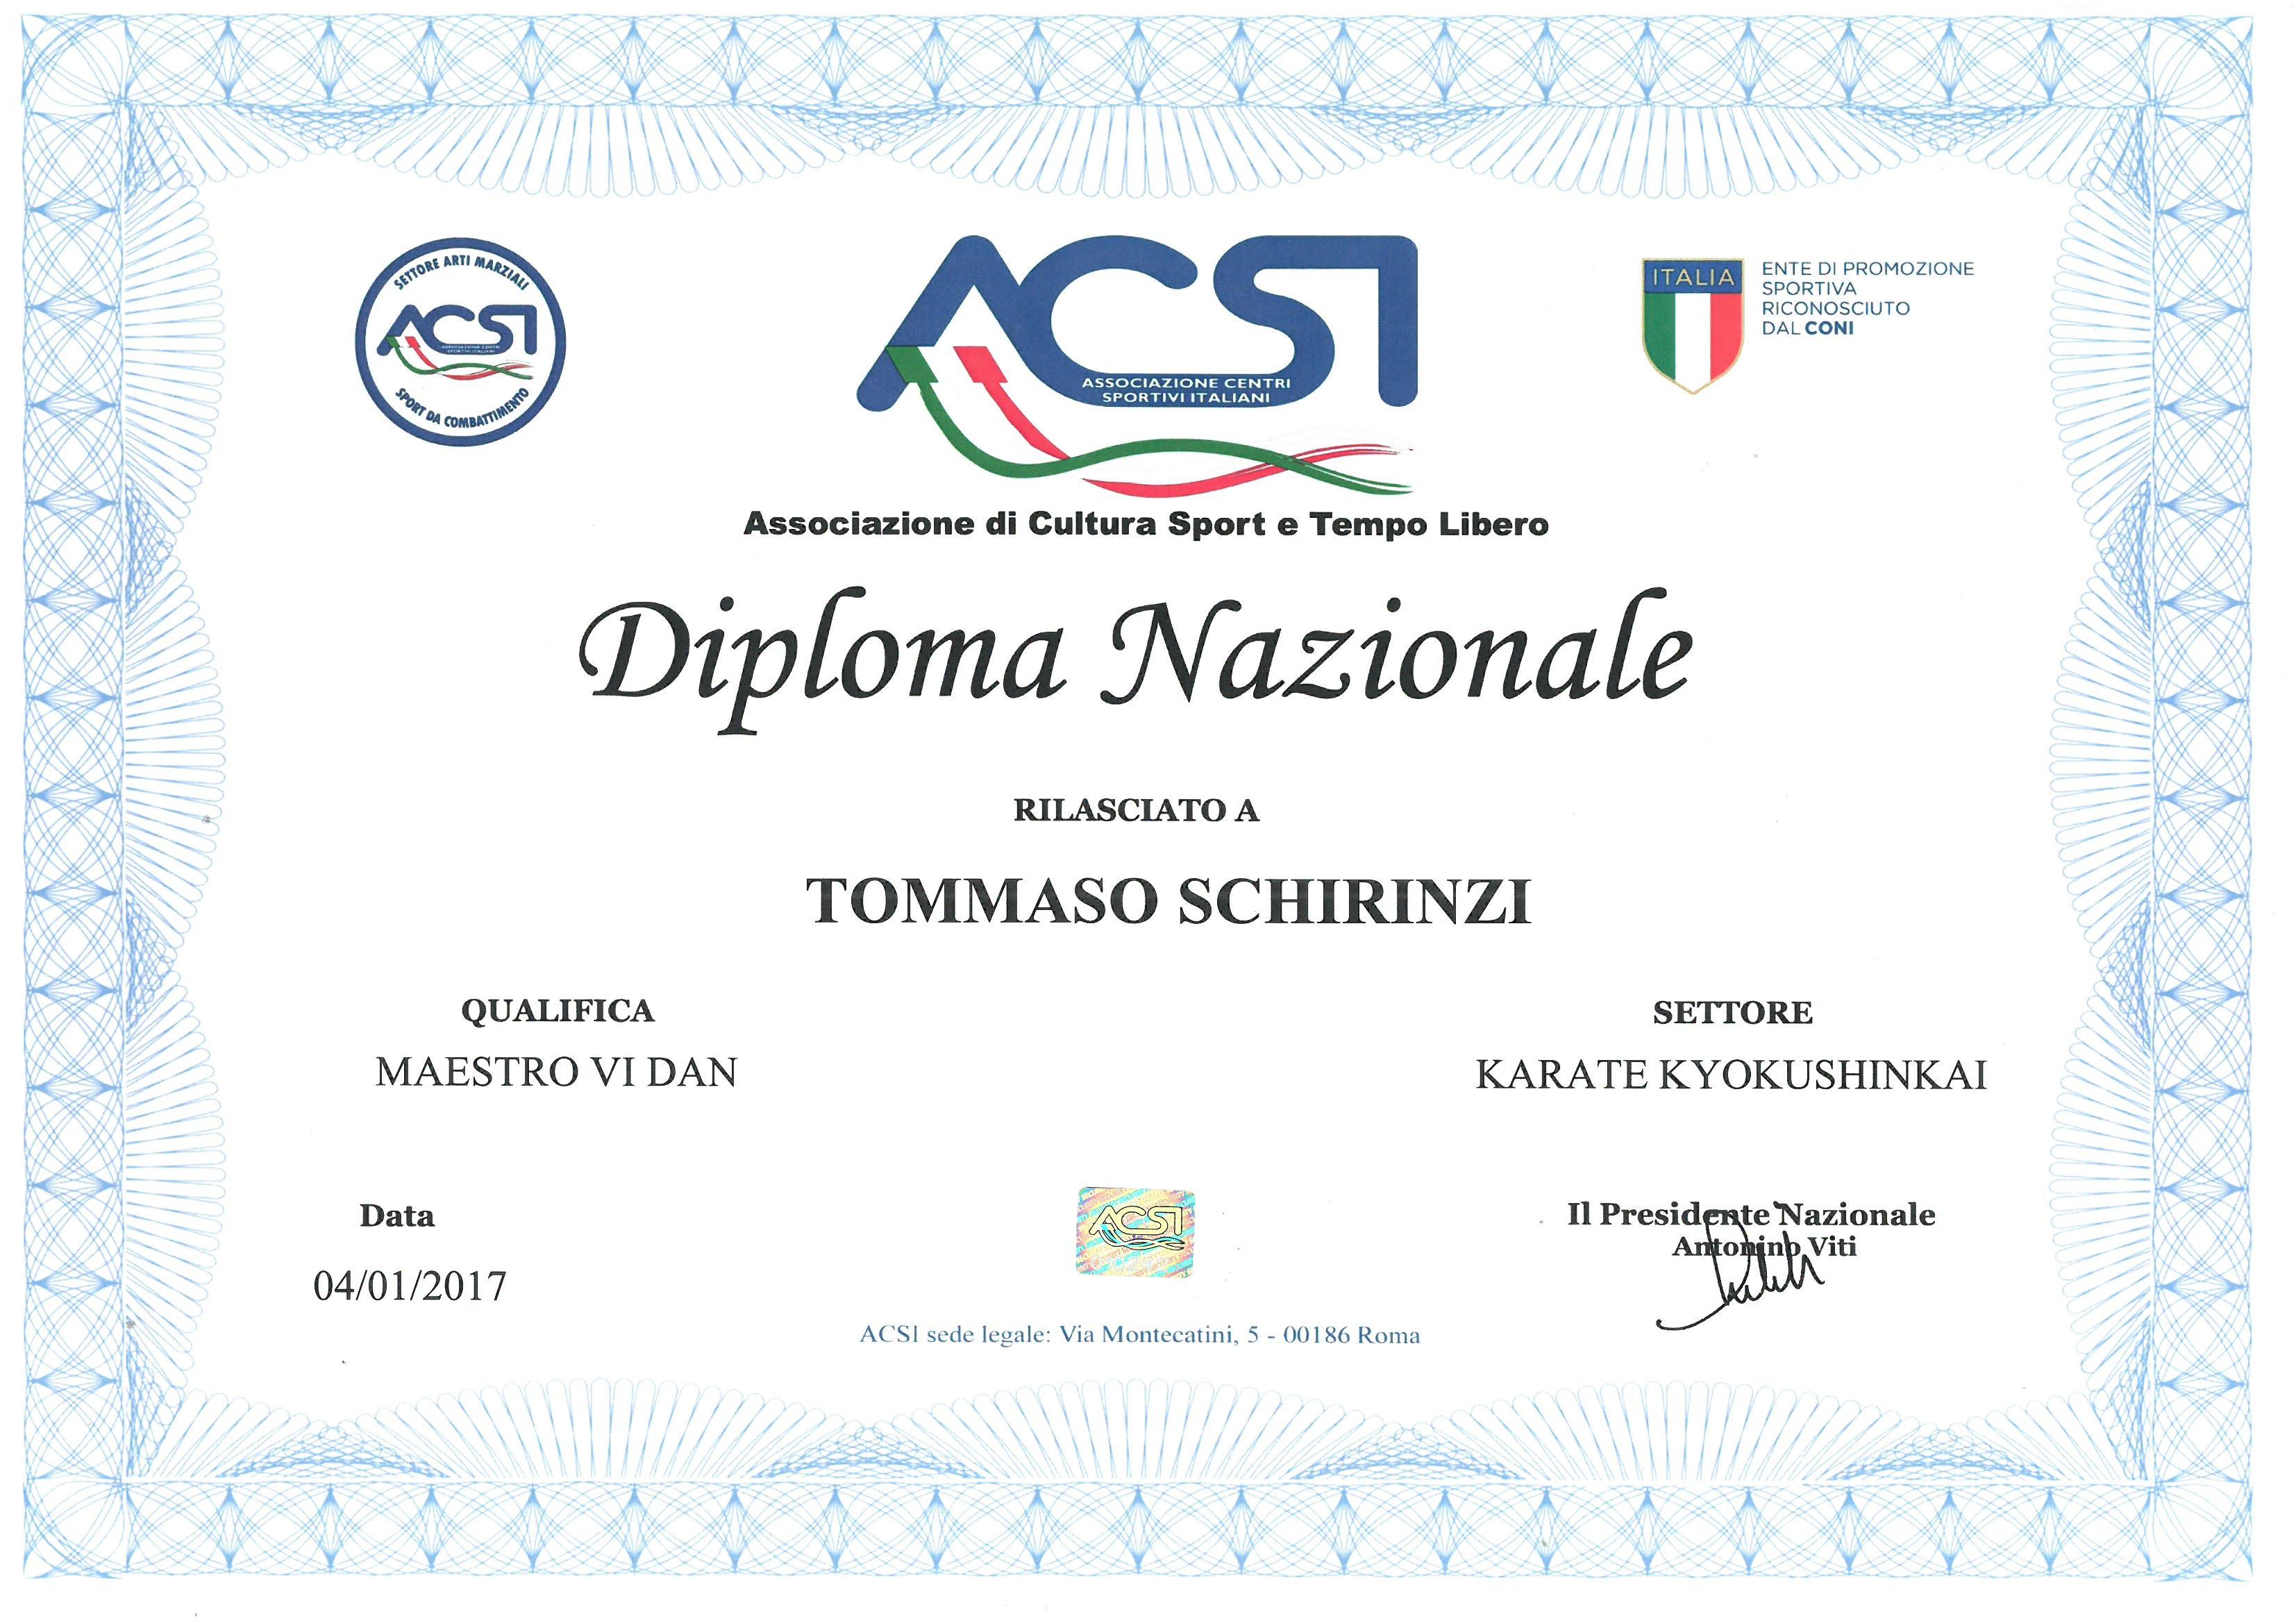 acsi karate tommaso schirinzi diploma maestro riconoscimento grado ente kyokushinkai shihan parte dell